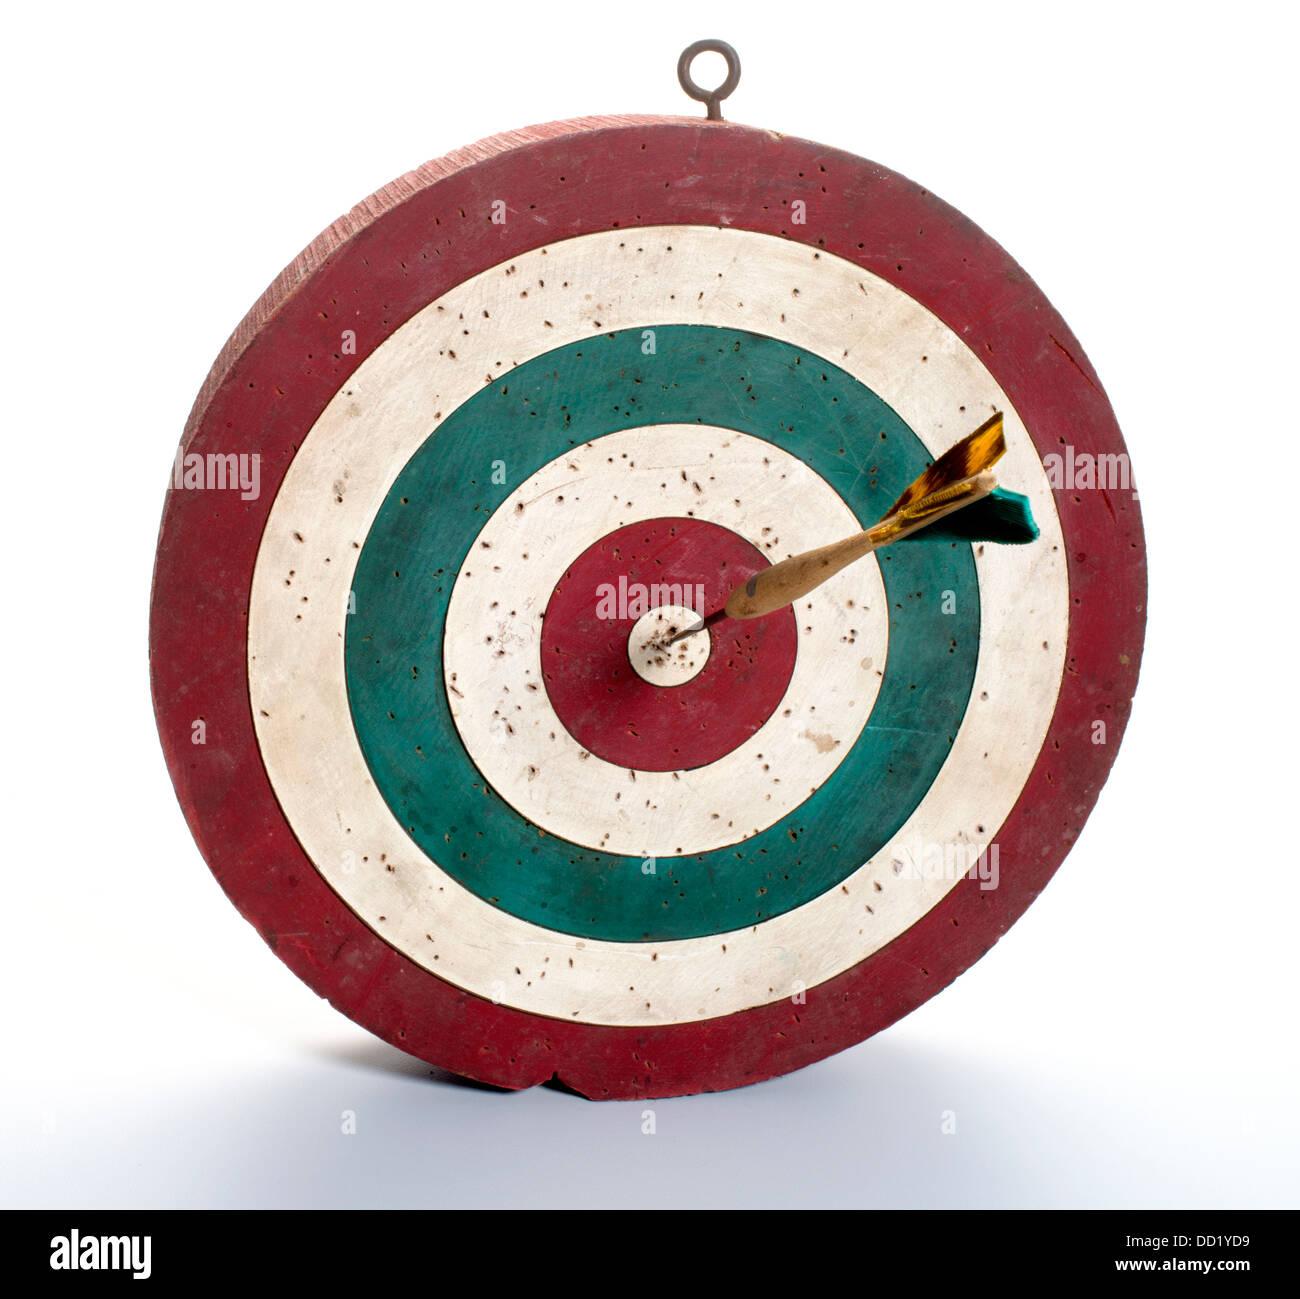 dart board - Stock Image